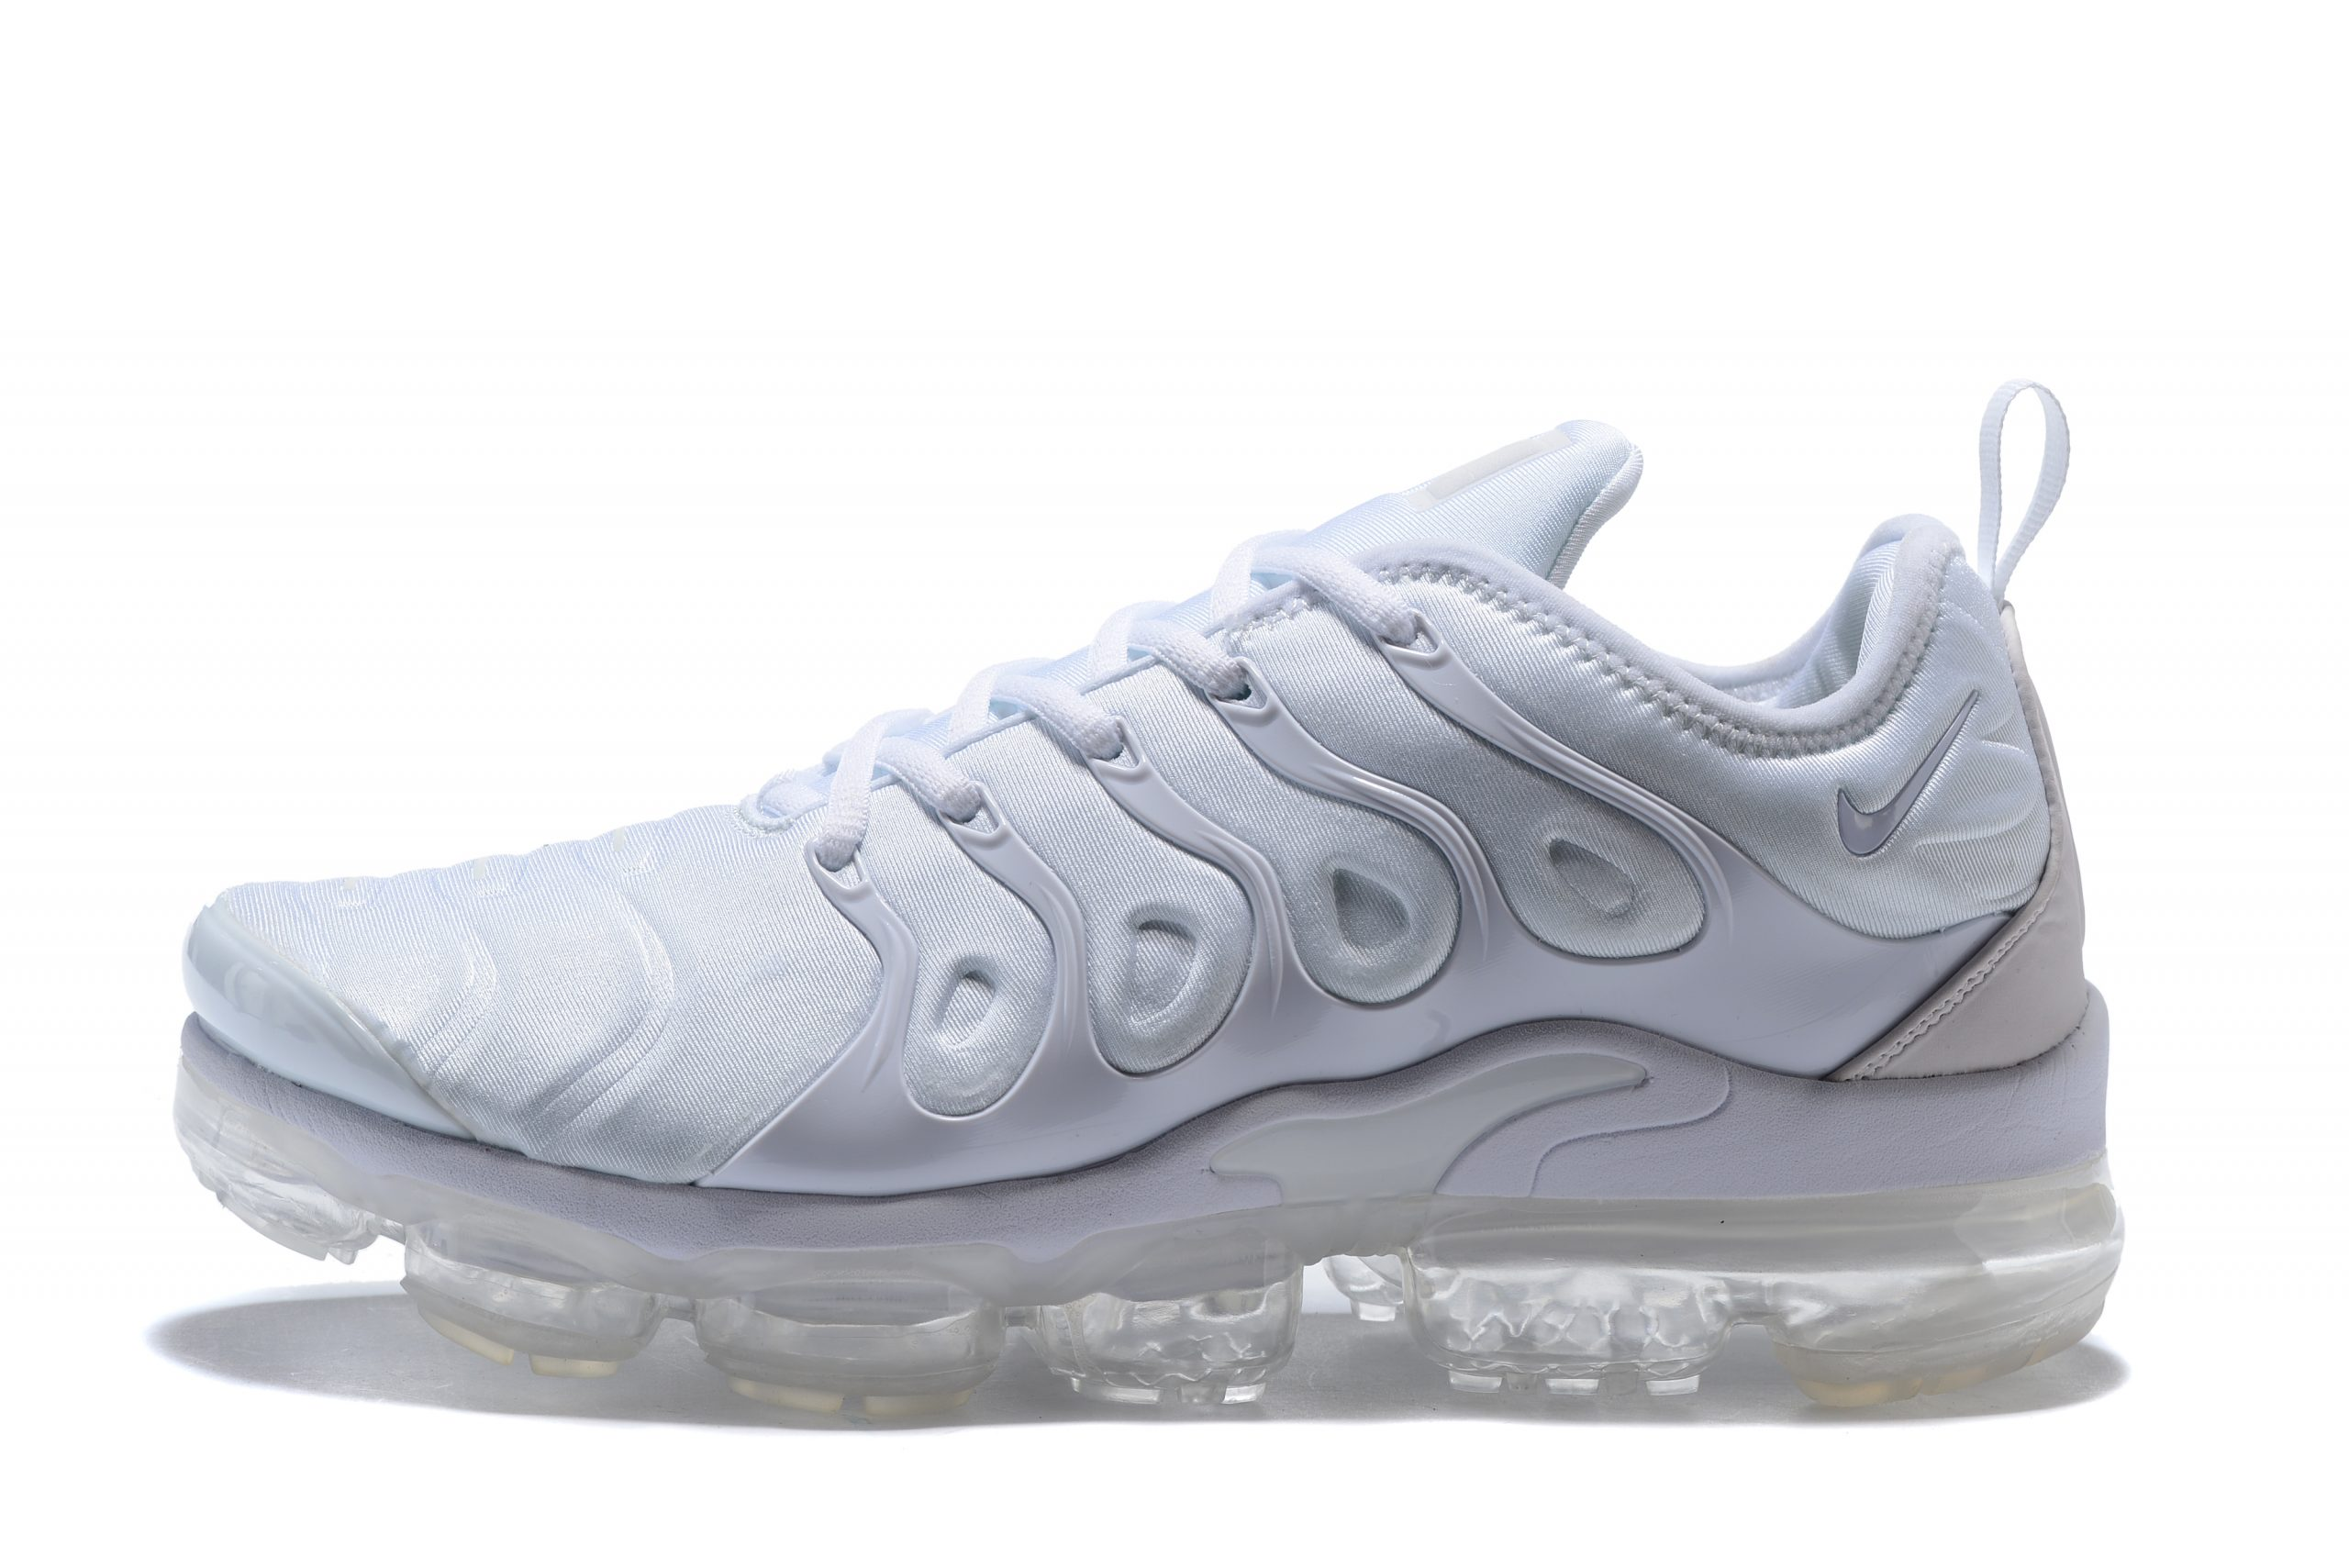 Nike Air Vapormax Plus Triple White